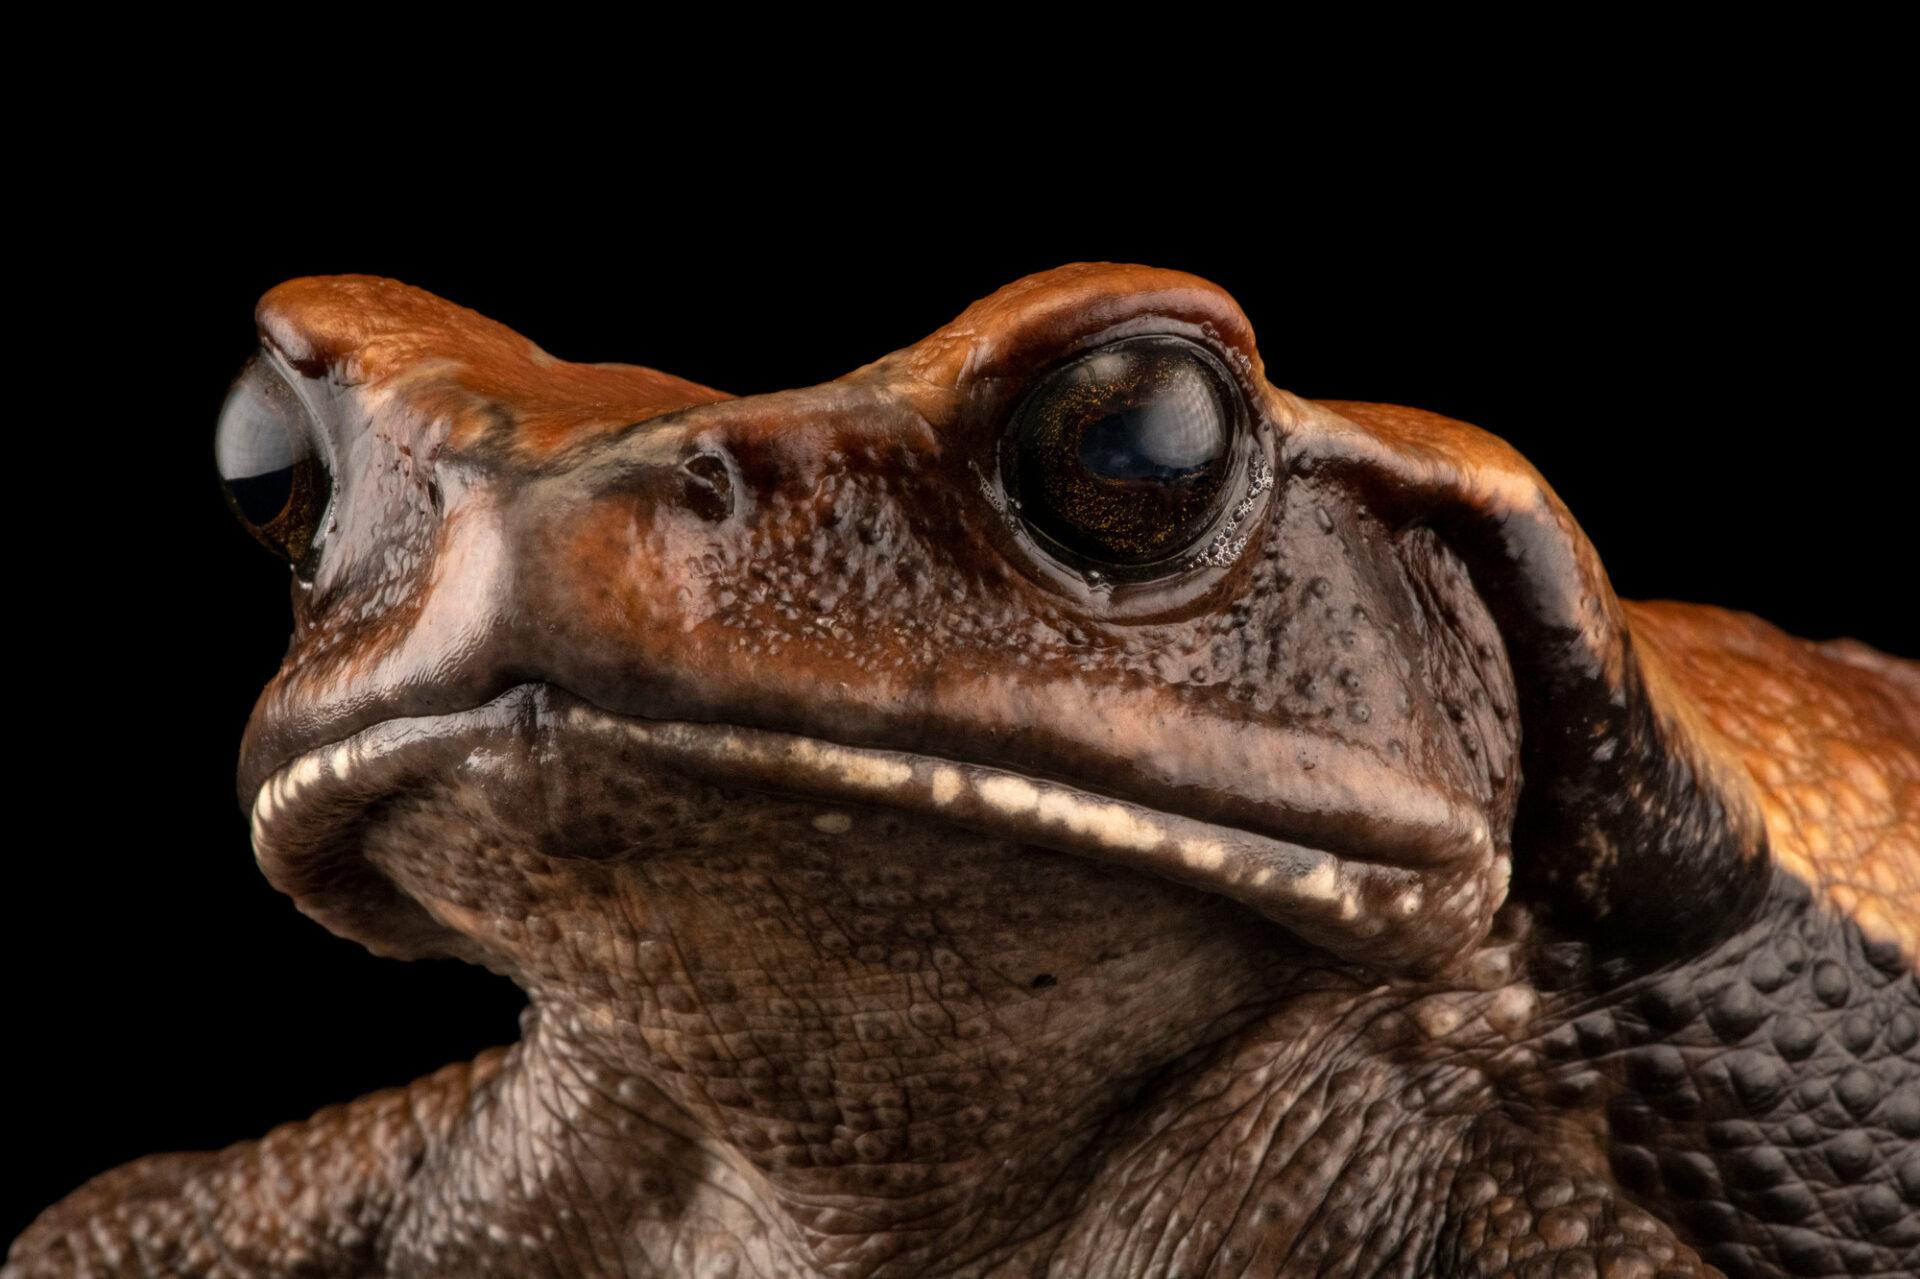 Photo: A giant Blomberg toad (Rhaebo blombergi) at Centro Jambatu in Quito, Ecuador.